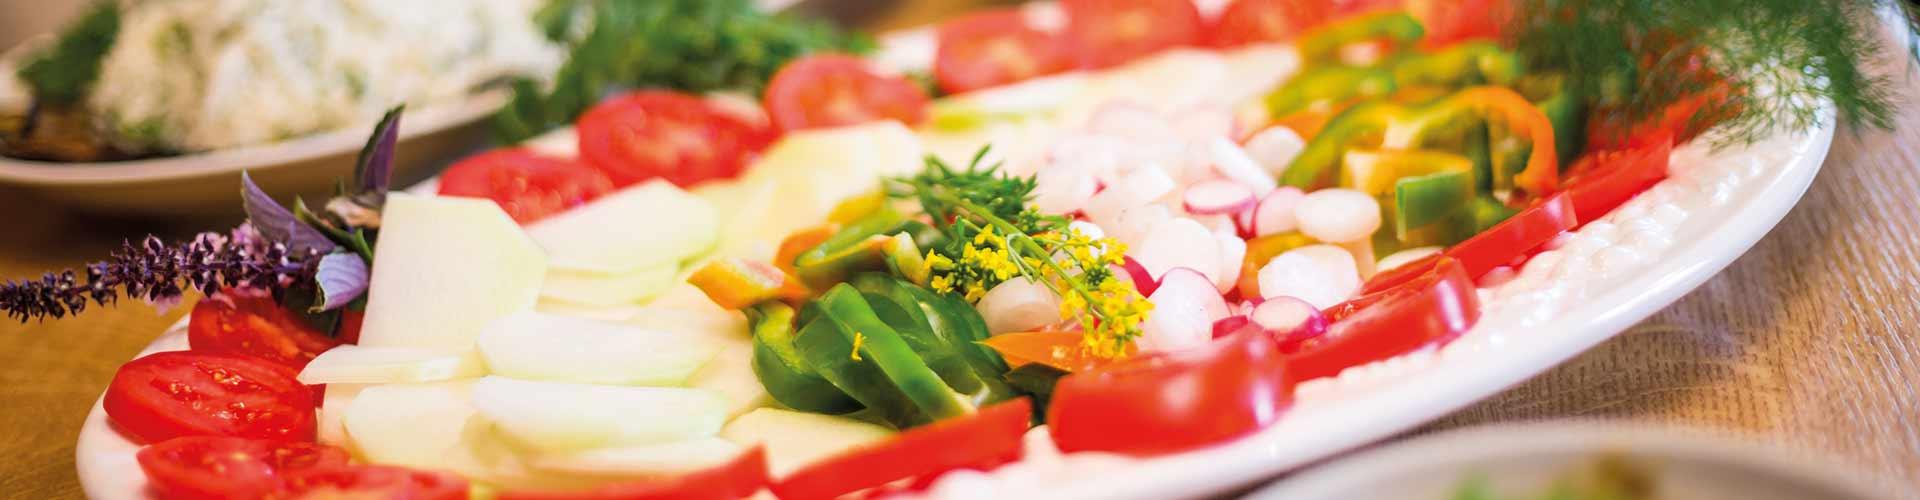 Frischer-Salatteller-1920x500px